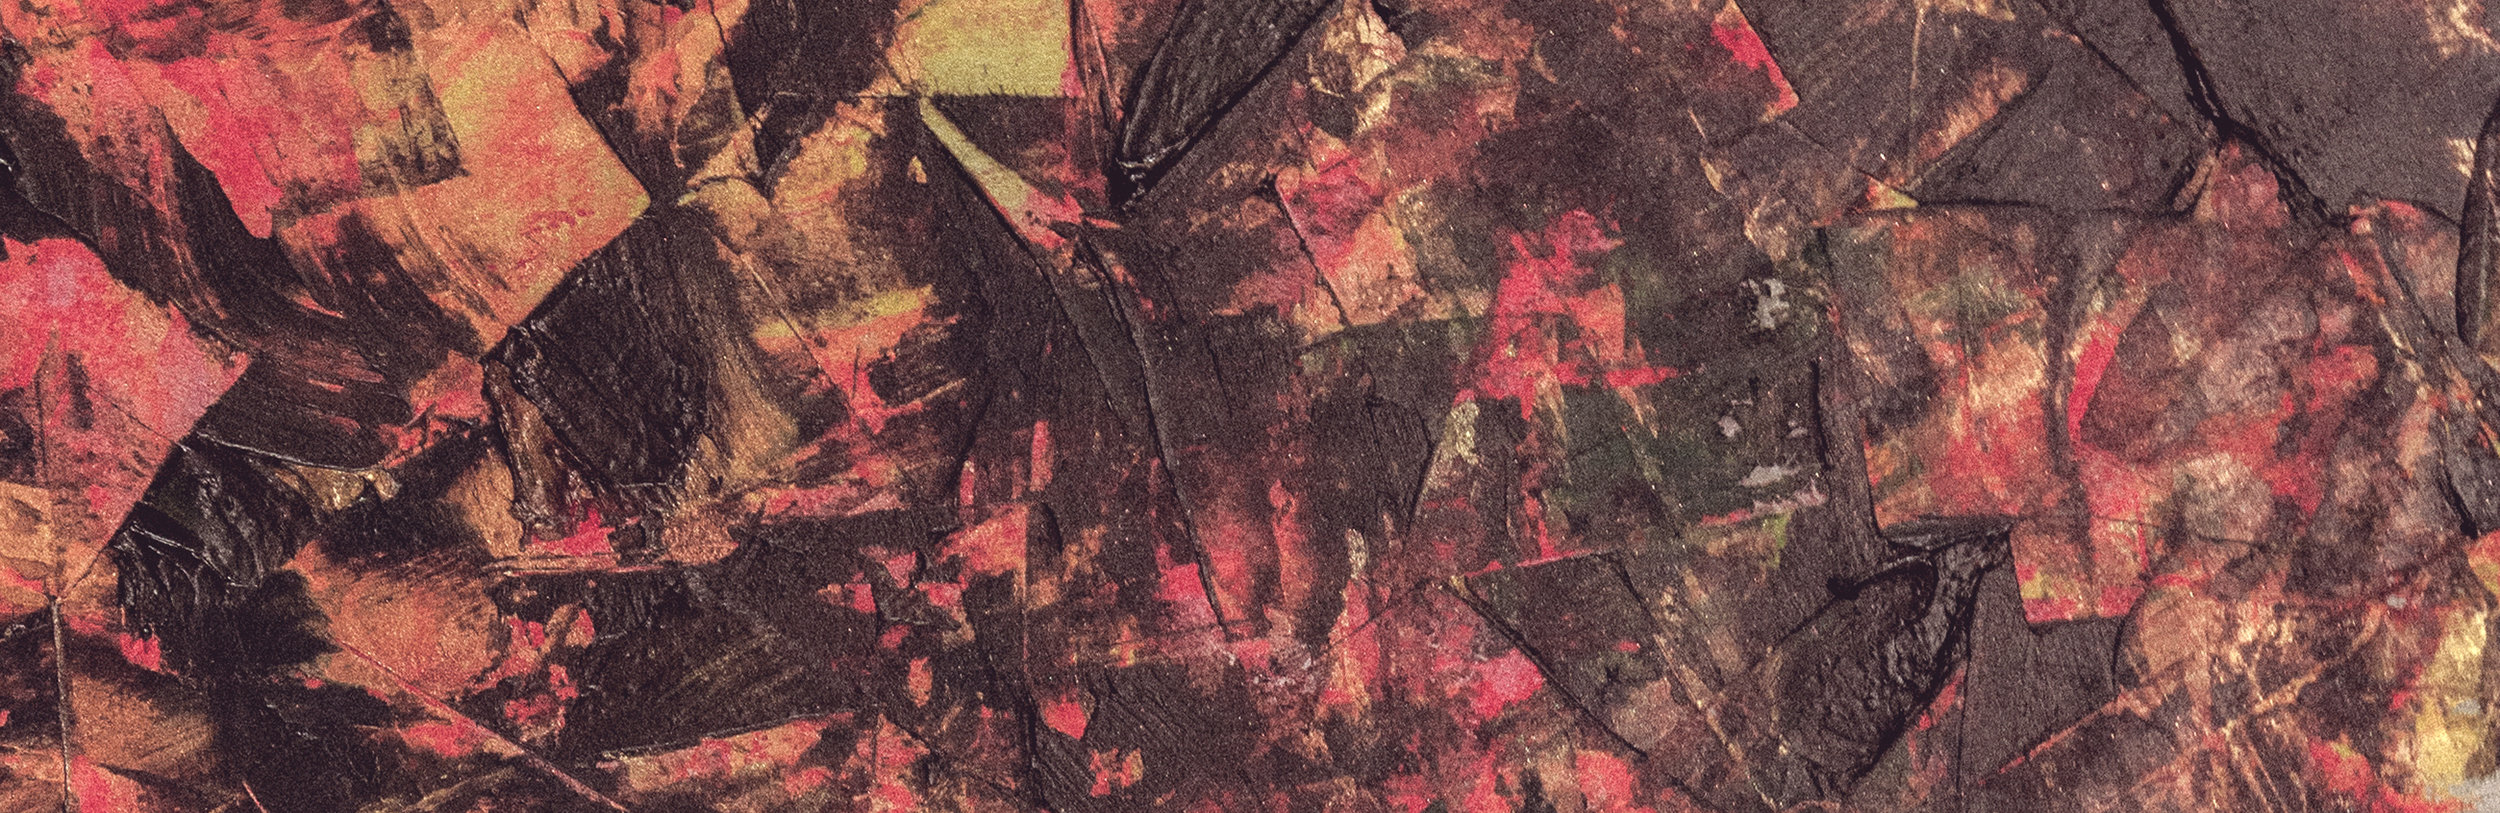 bonjourmolotov+Saudade+Illustration+Ilustracao+painting+pintura+acrylic+acrílico+canvas+tela+paper+cardboard+mdf+Andre+Gigante+08-cópia.jpg